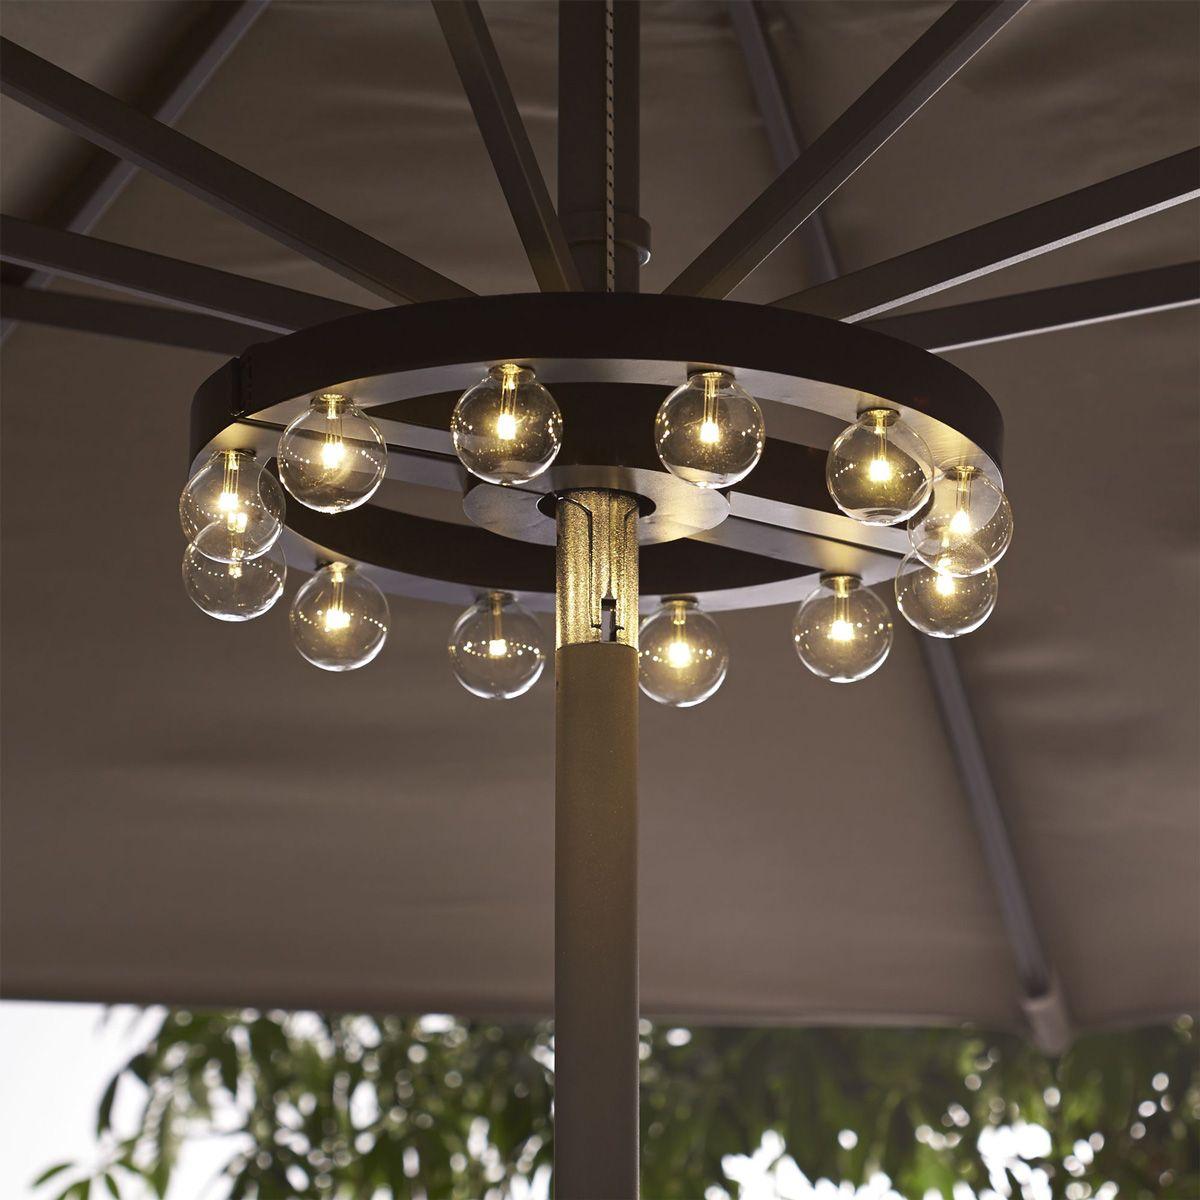 Patio Umbrella Marquee Lights Patio Umbrella Lights Umbrella Lights Best Outdoor Lighting